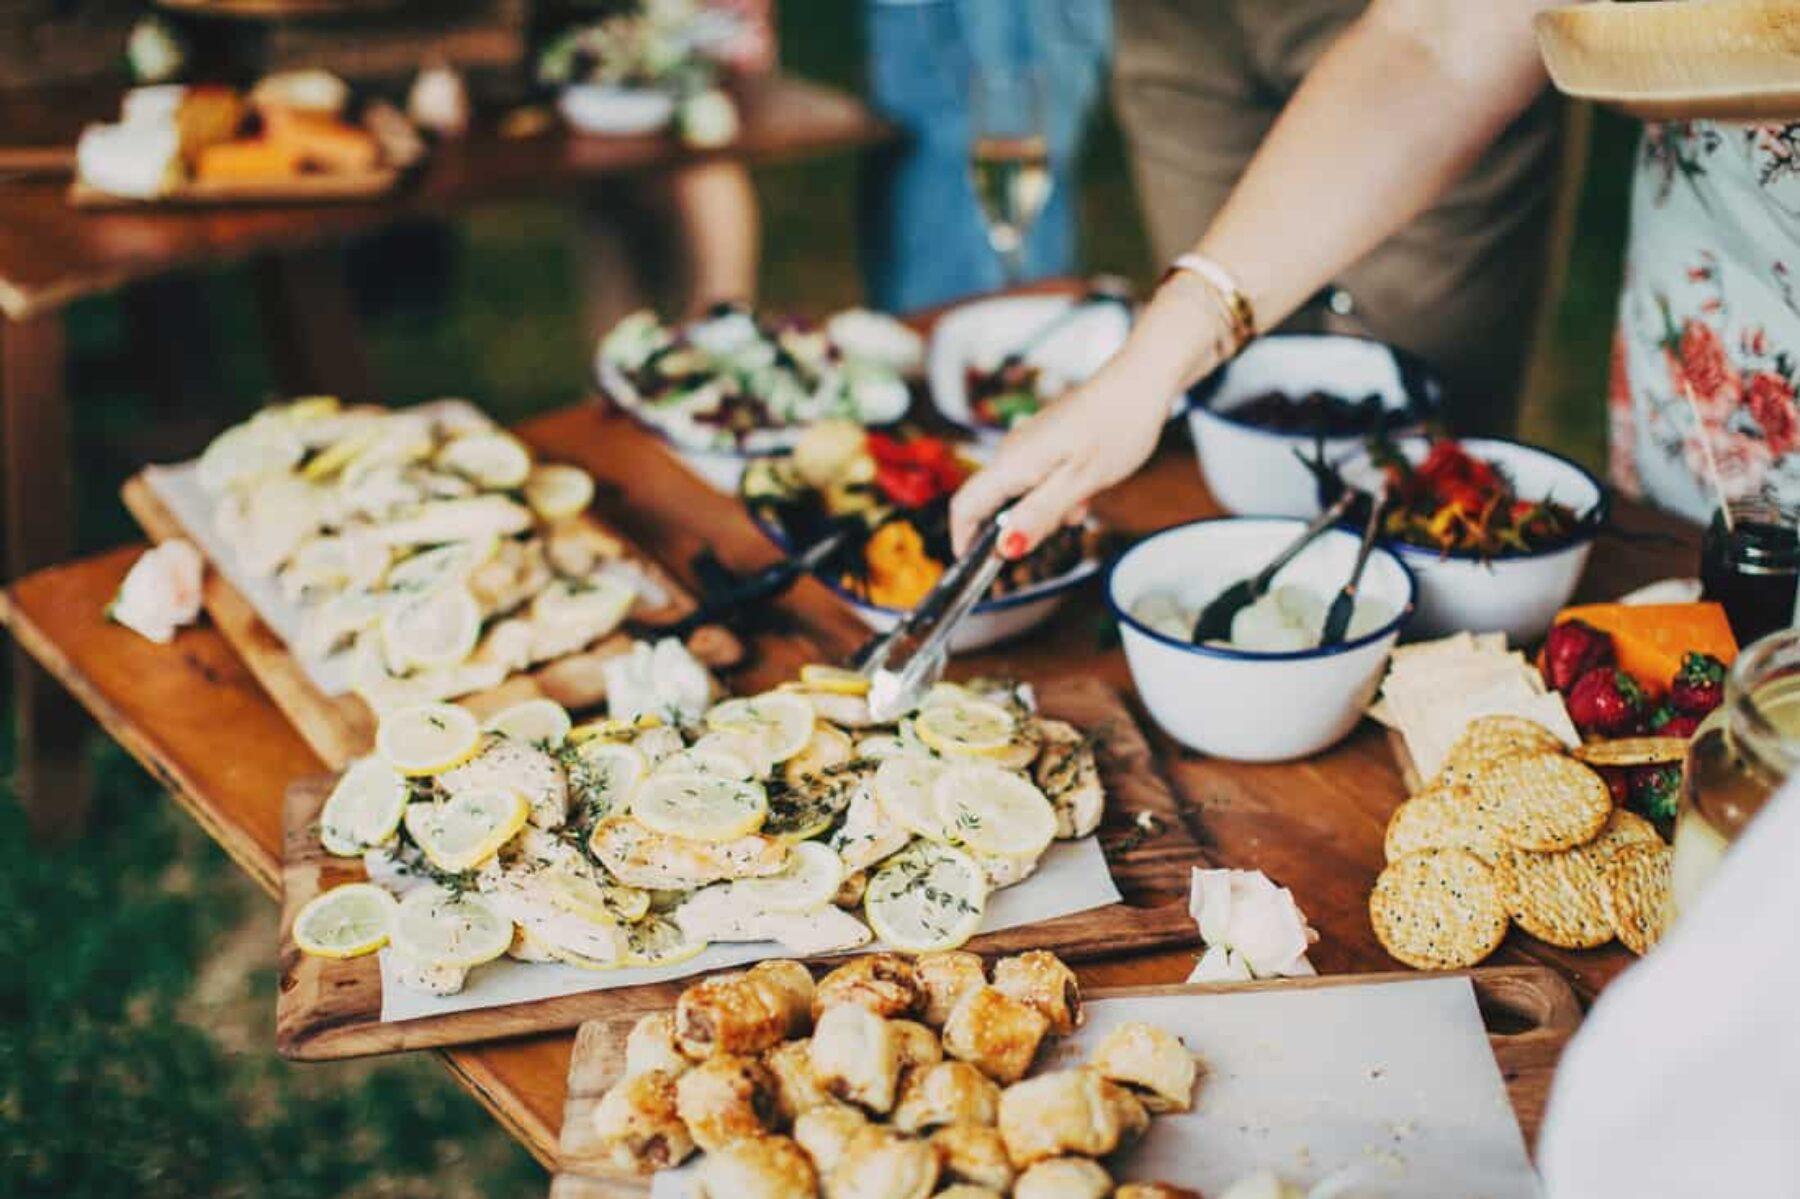 Posh picnic wedding at Centennial Park Sydney